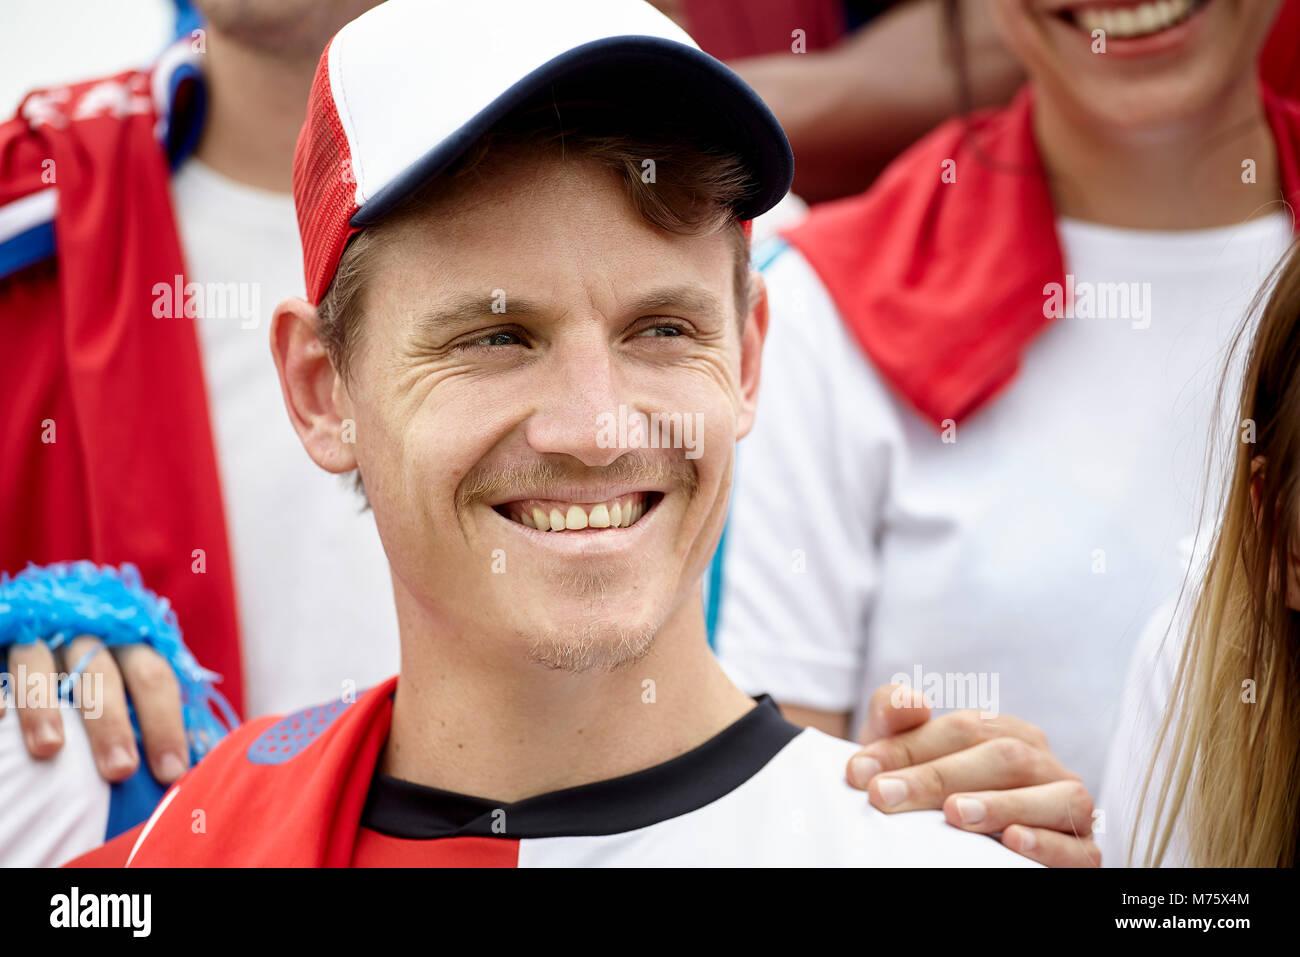 Fußball-Fan lächelnd im Match, Porträt Stockbild